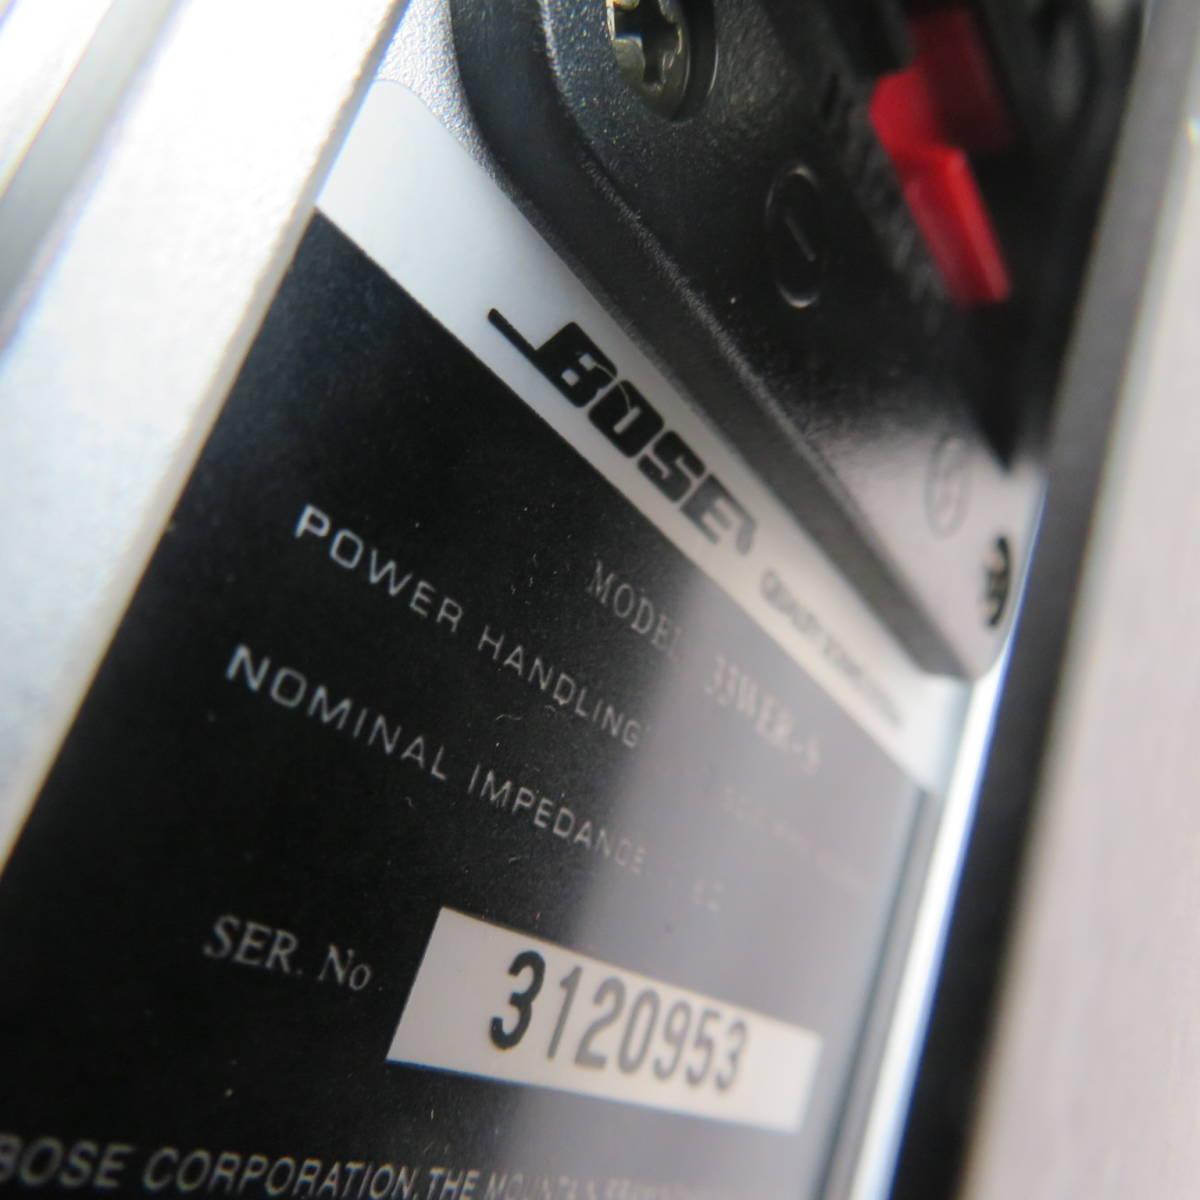 BOSE 33WER-S スピーカーシステム ボーズ 動作未確認 (20-1059) _画像7